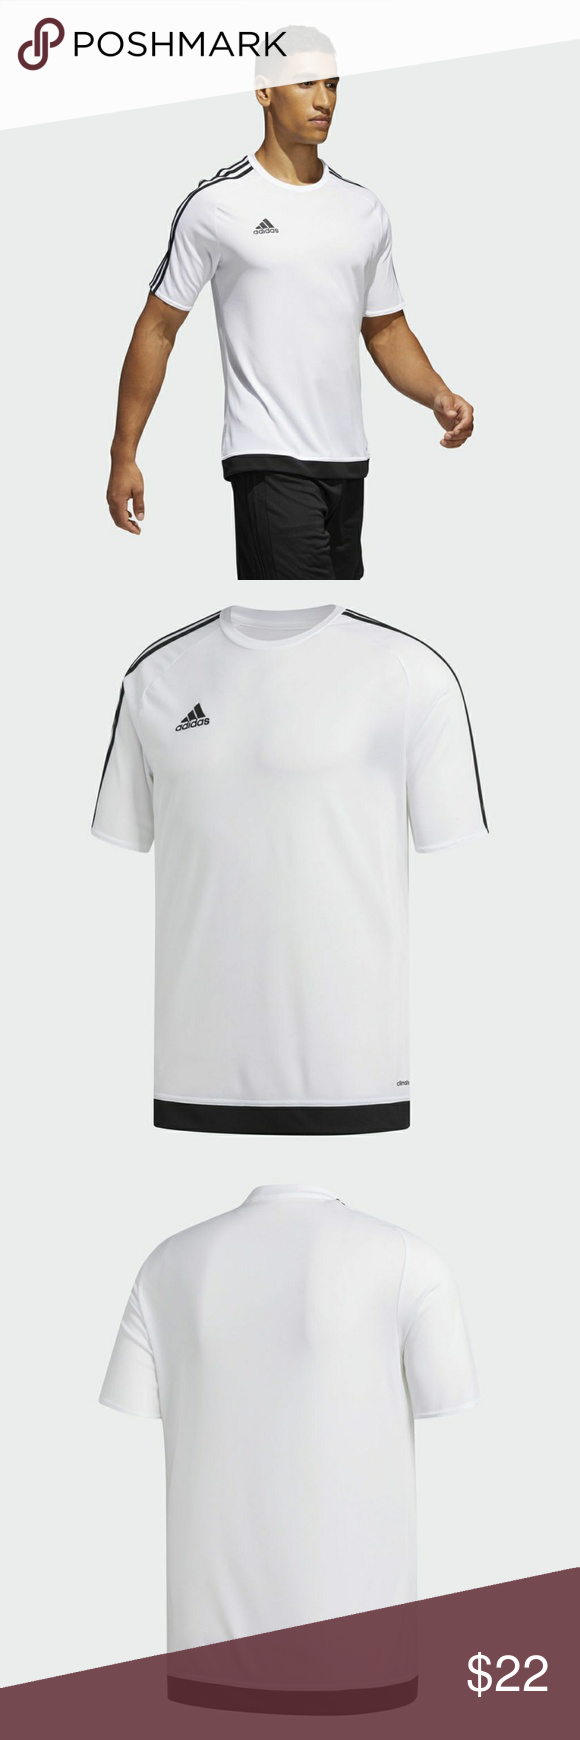 tanque Situación montar  MAN FOOTBALL ESTRO 15 SHIRT S16146 T1   15th shirt, Adidas shirt, Shirts